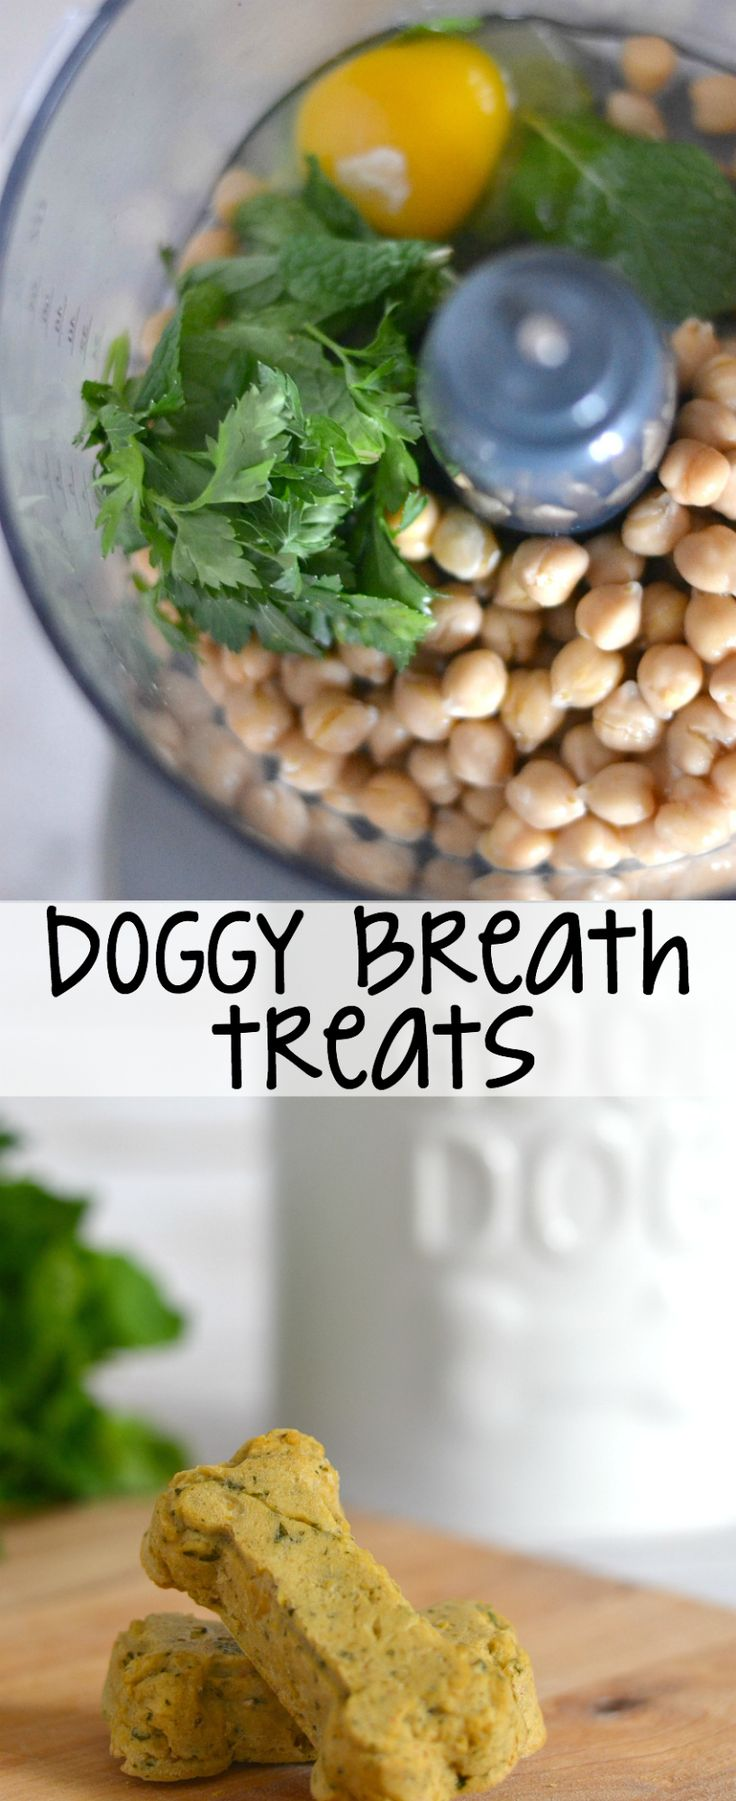 These homemade dog treats help stinky breath!